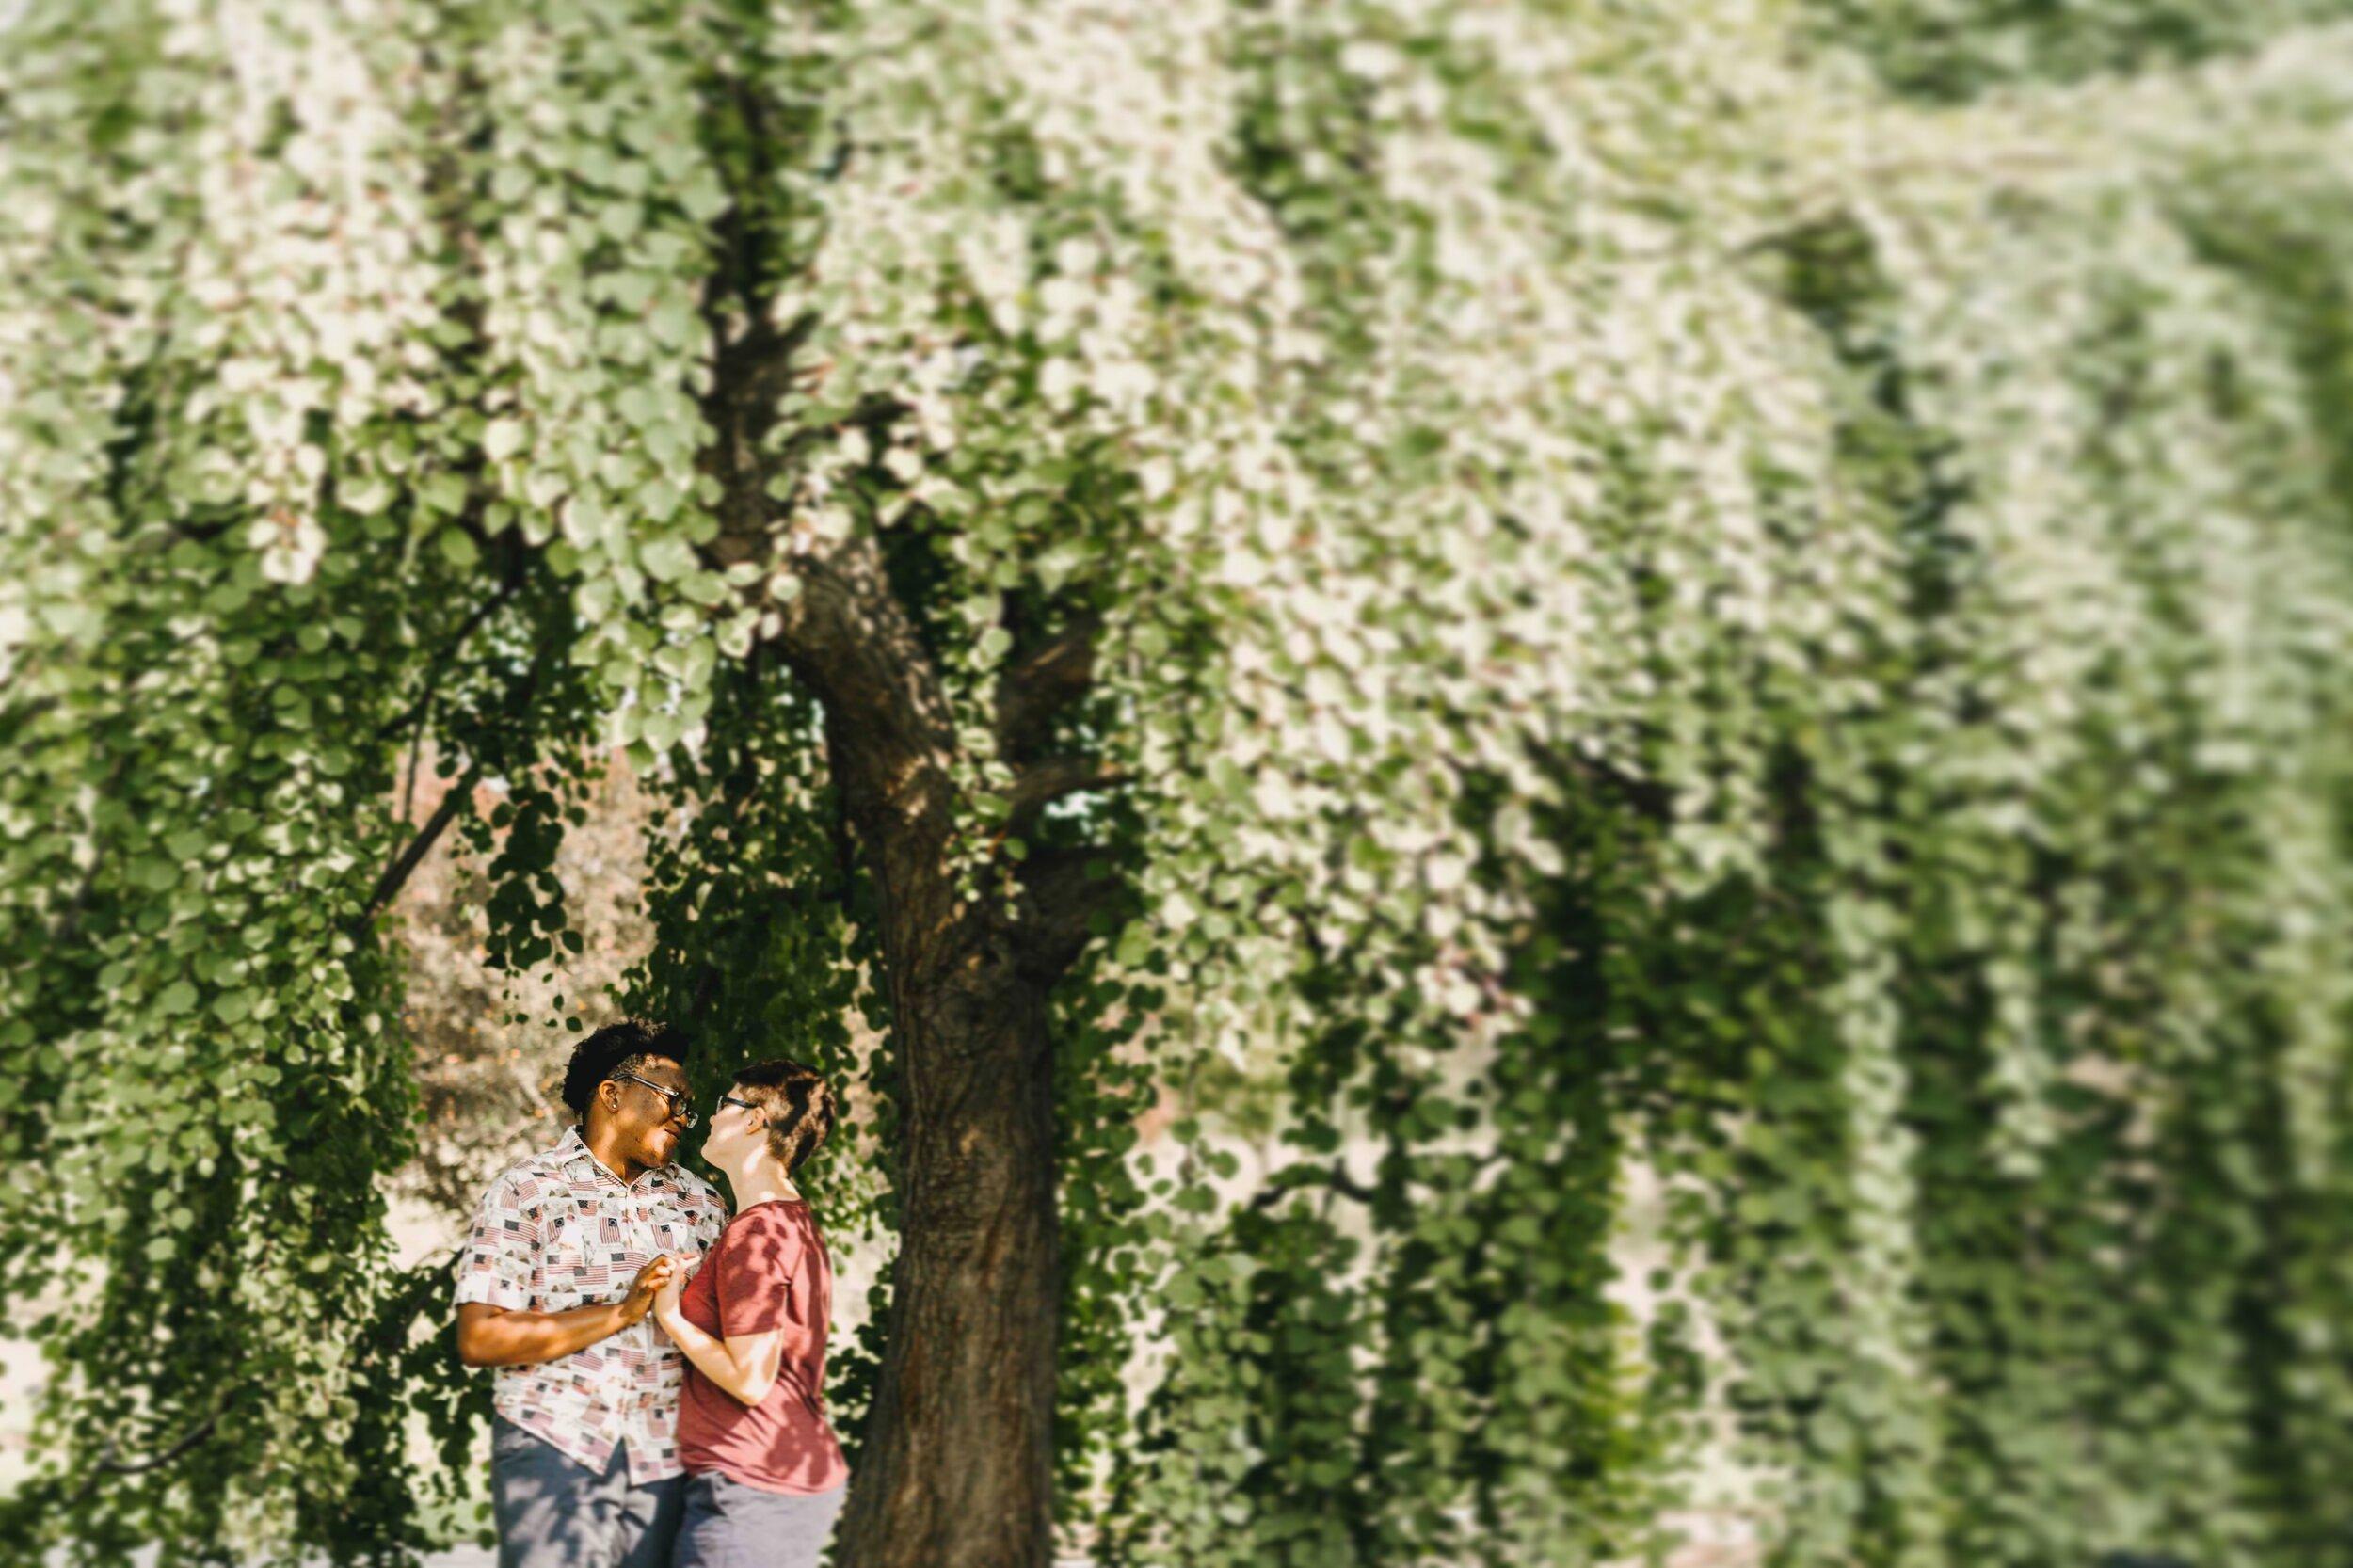 queer-lesbian-engagement-wedding-photography-tacoma-washington-halle-roland-photography.JPG